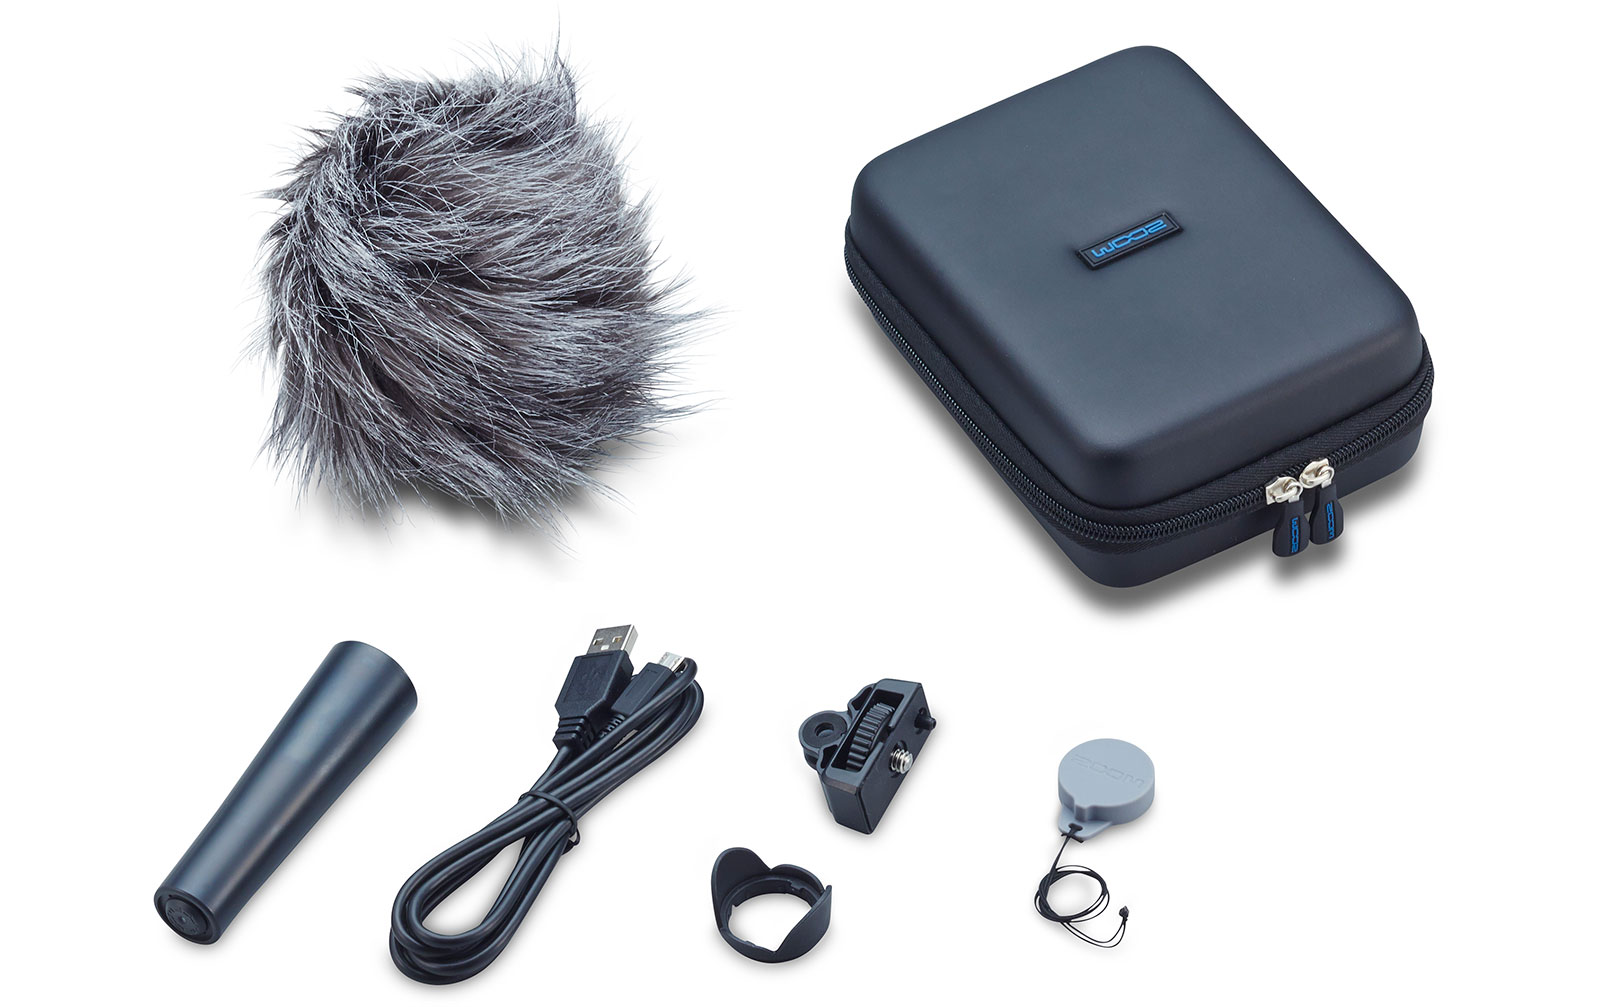 zoom-apq-2n-accessory-pack-fa-r-q2n